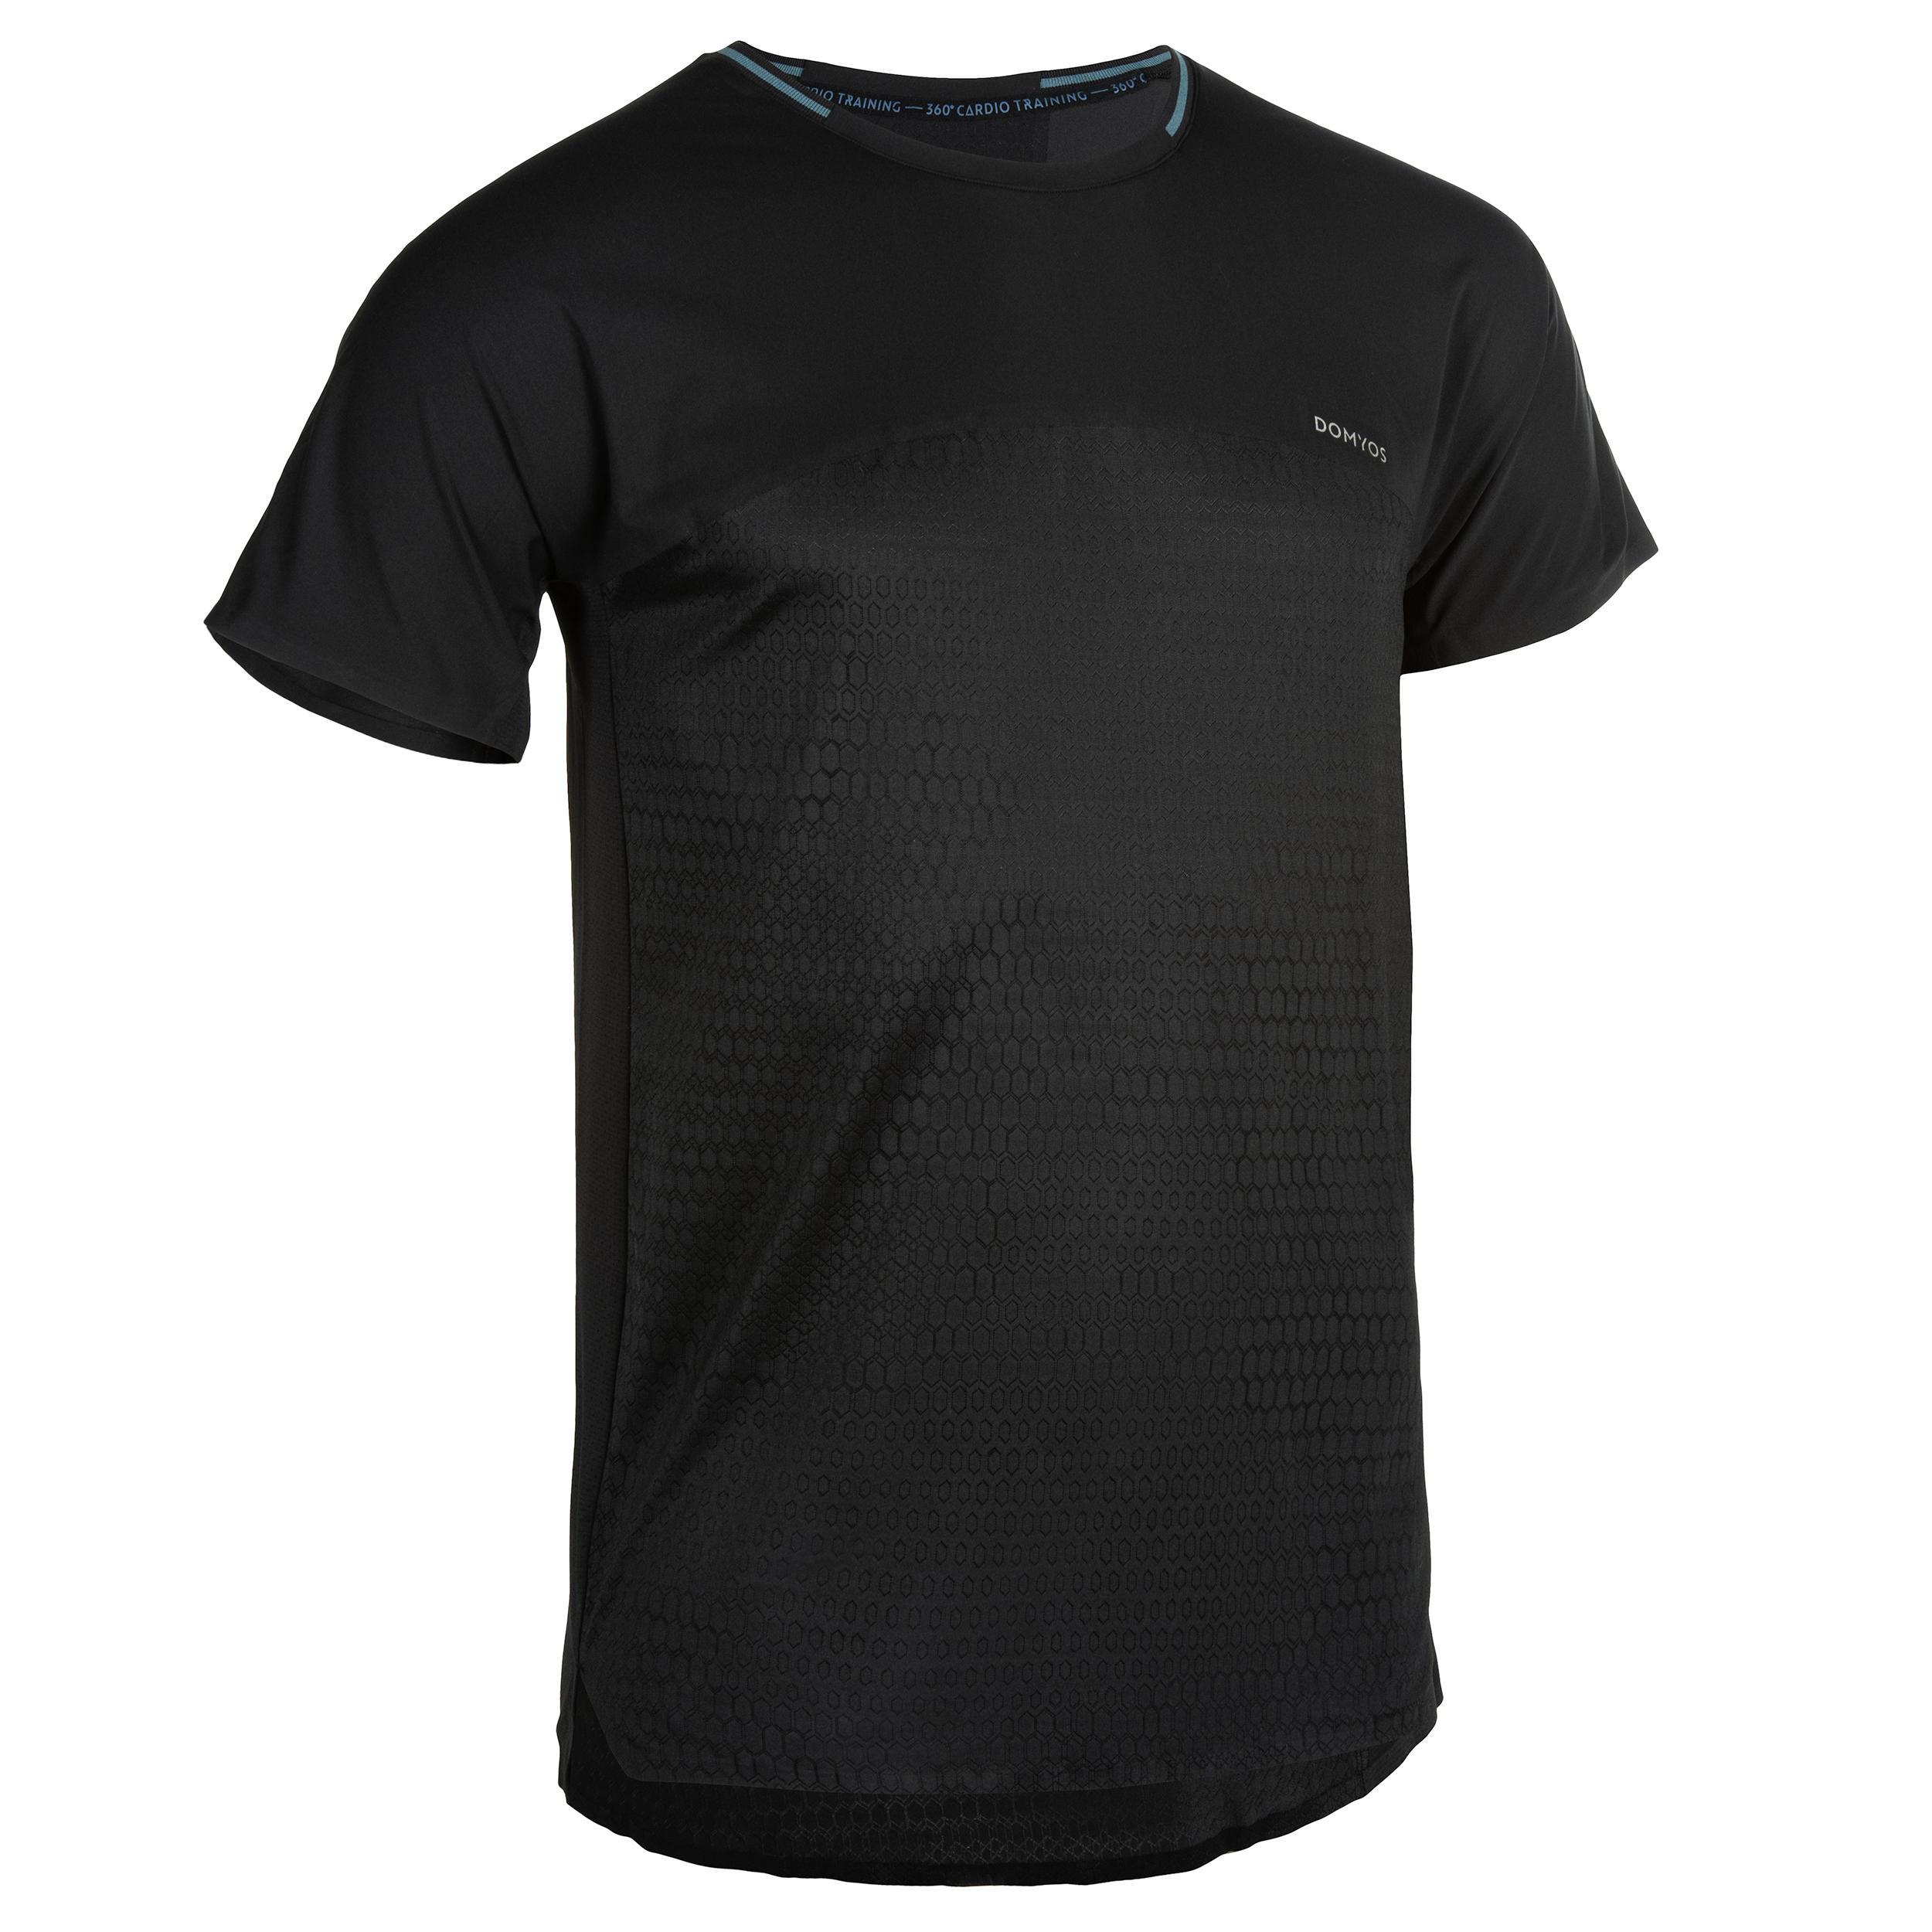 T-Shirt FTS 920 Fitness Cardio Herren schwarz | Sportbekleidung > Sportshirts > Poloshirts | Schwarz | Domyos